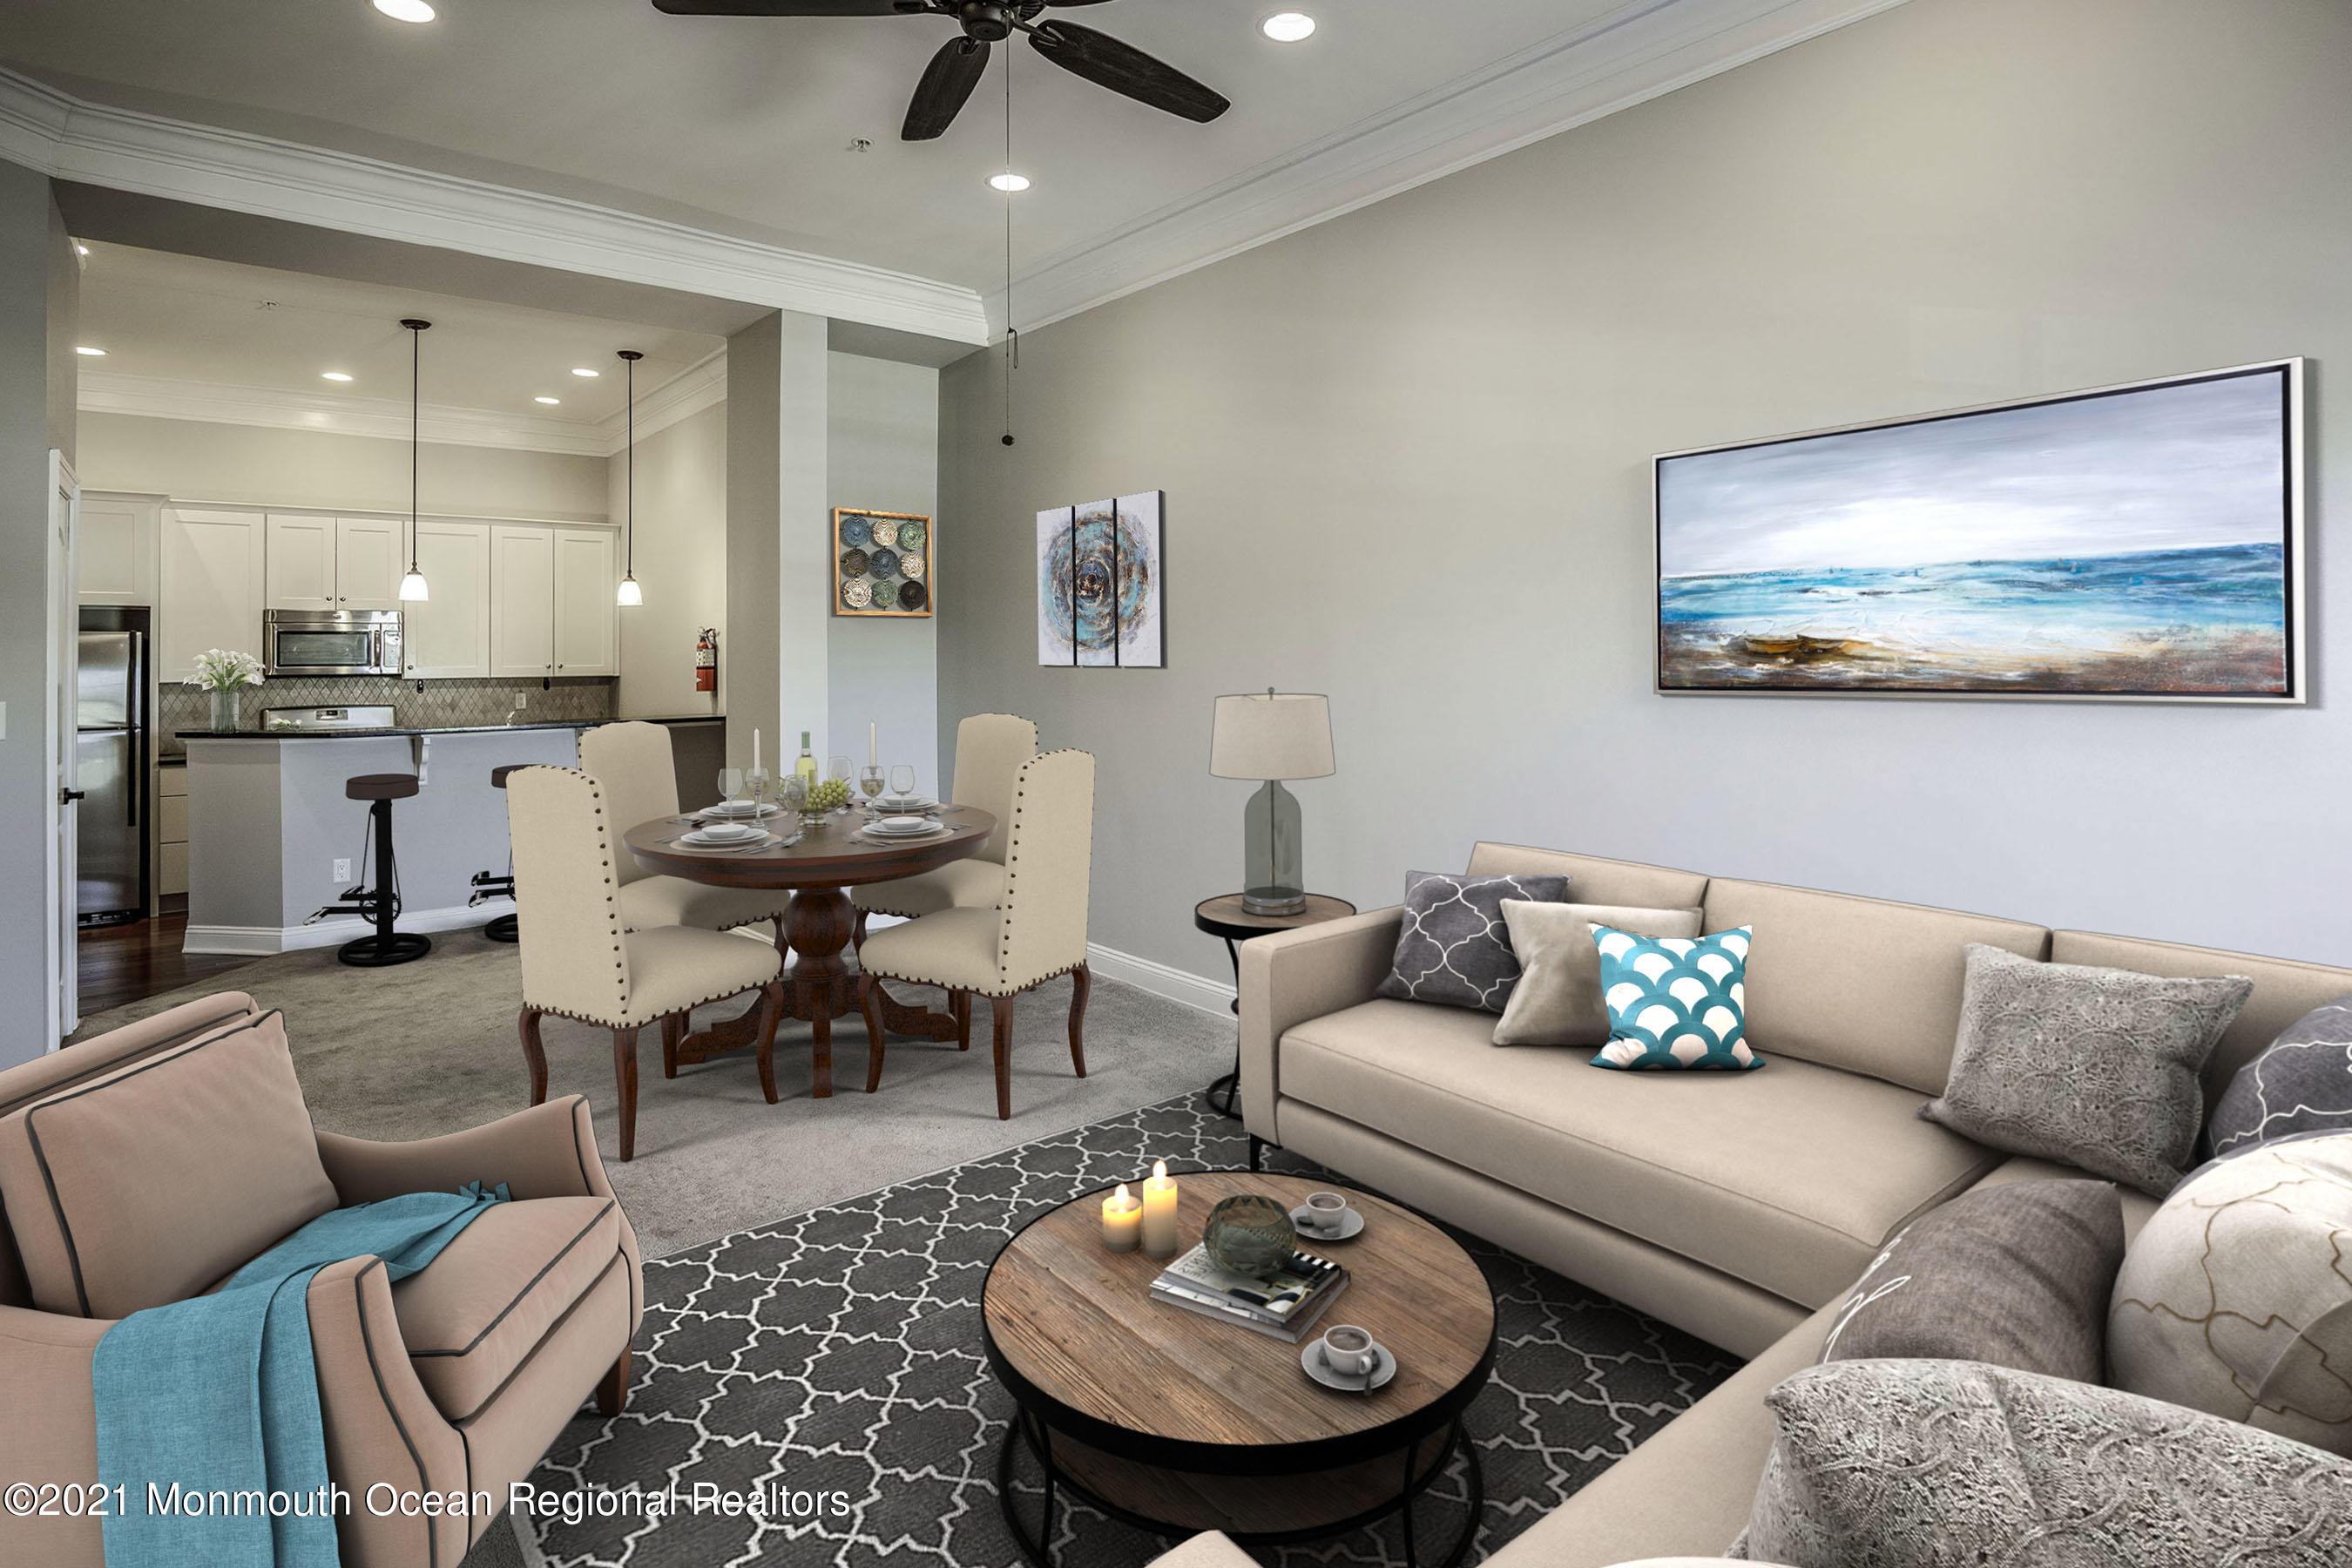 622 Trenton Avenue, Point Pleasant Beach, New Jersey 08742, 2 Bedrooms Bedrooms, ,2 BathroomsBathrooms,Condominium,For Sale,622 Trenton Avenue,1,22105804